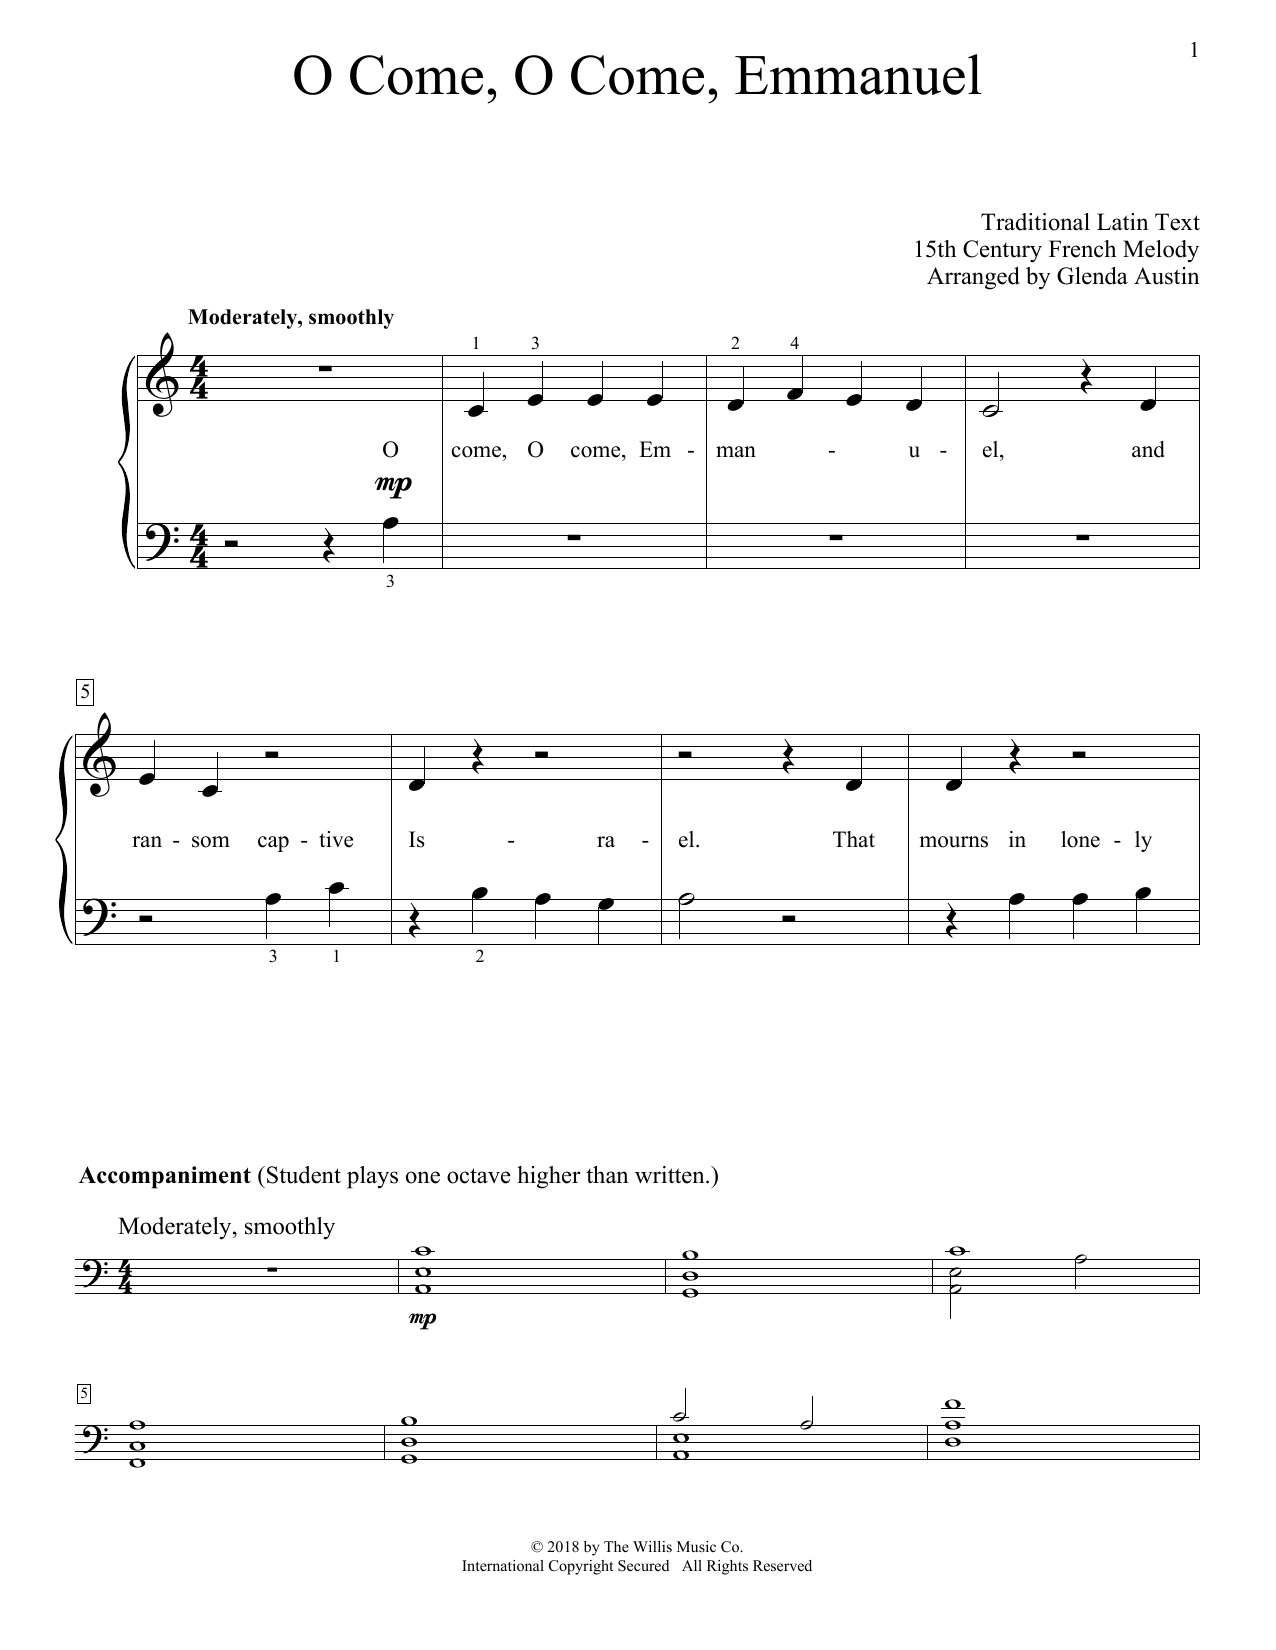 Glenda Austin O Come, O Come, Emmanuel sheet music notes and chords. Download Printable PDF.